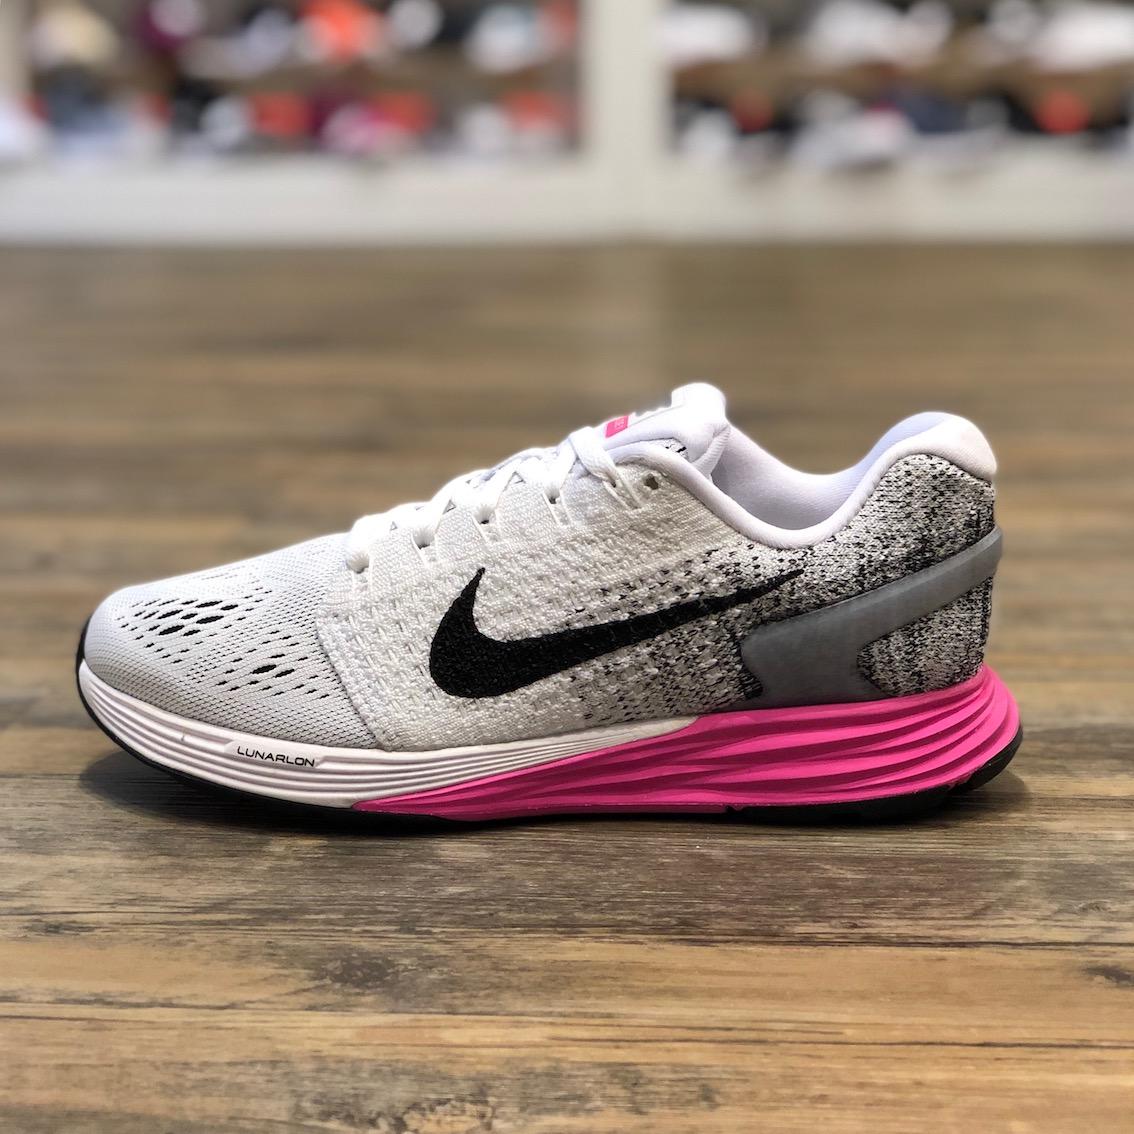 Details zu Nike Lunarglide 7 Gr.35,5 Schuhe Lauf Damen Neu 747356 106